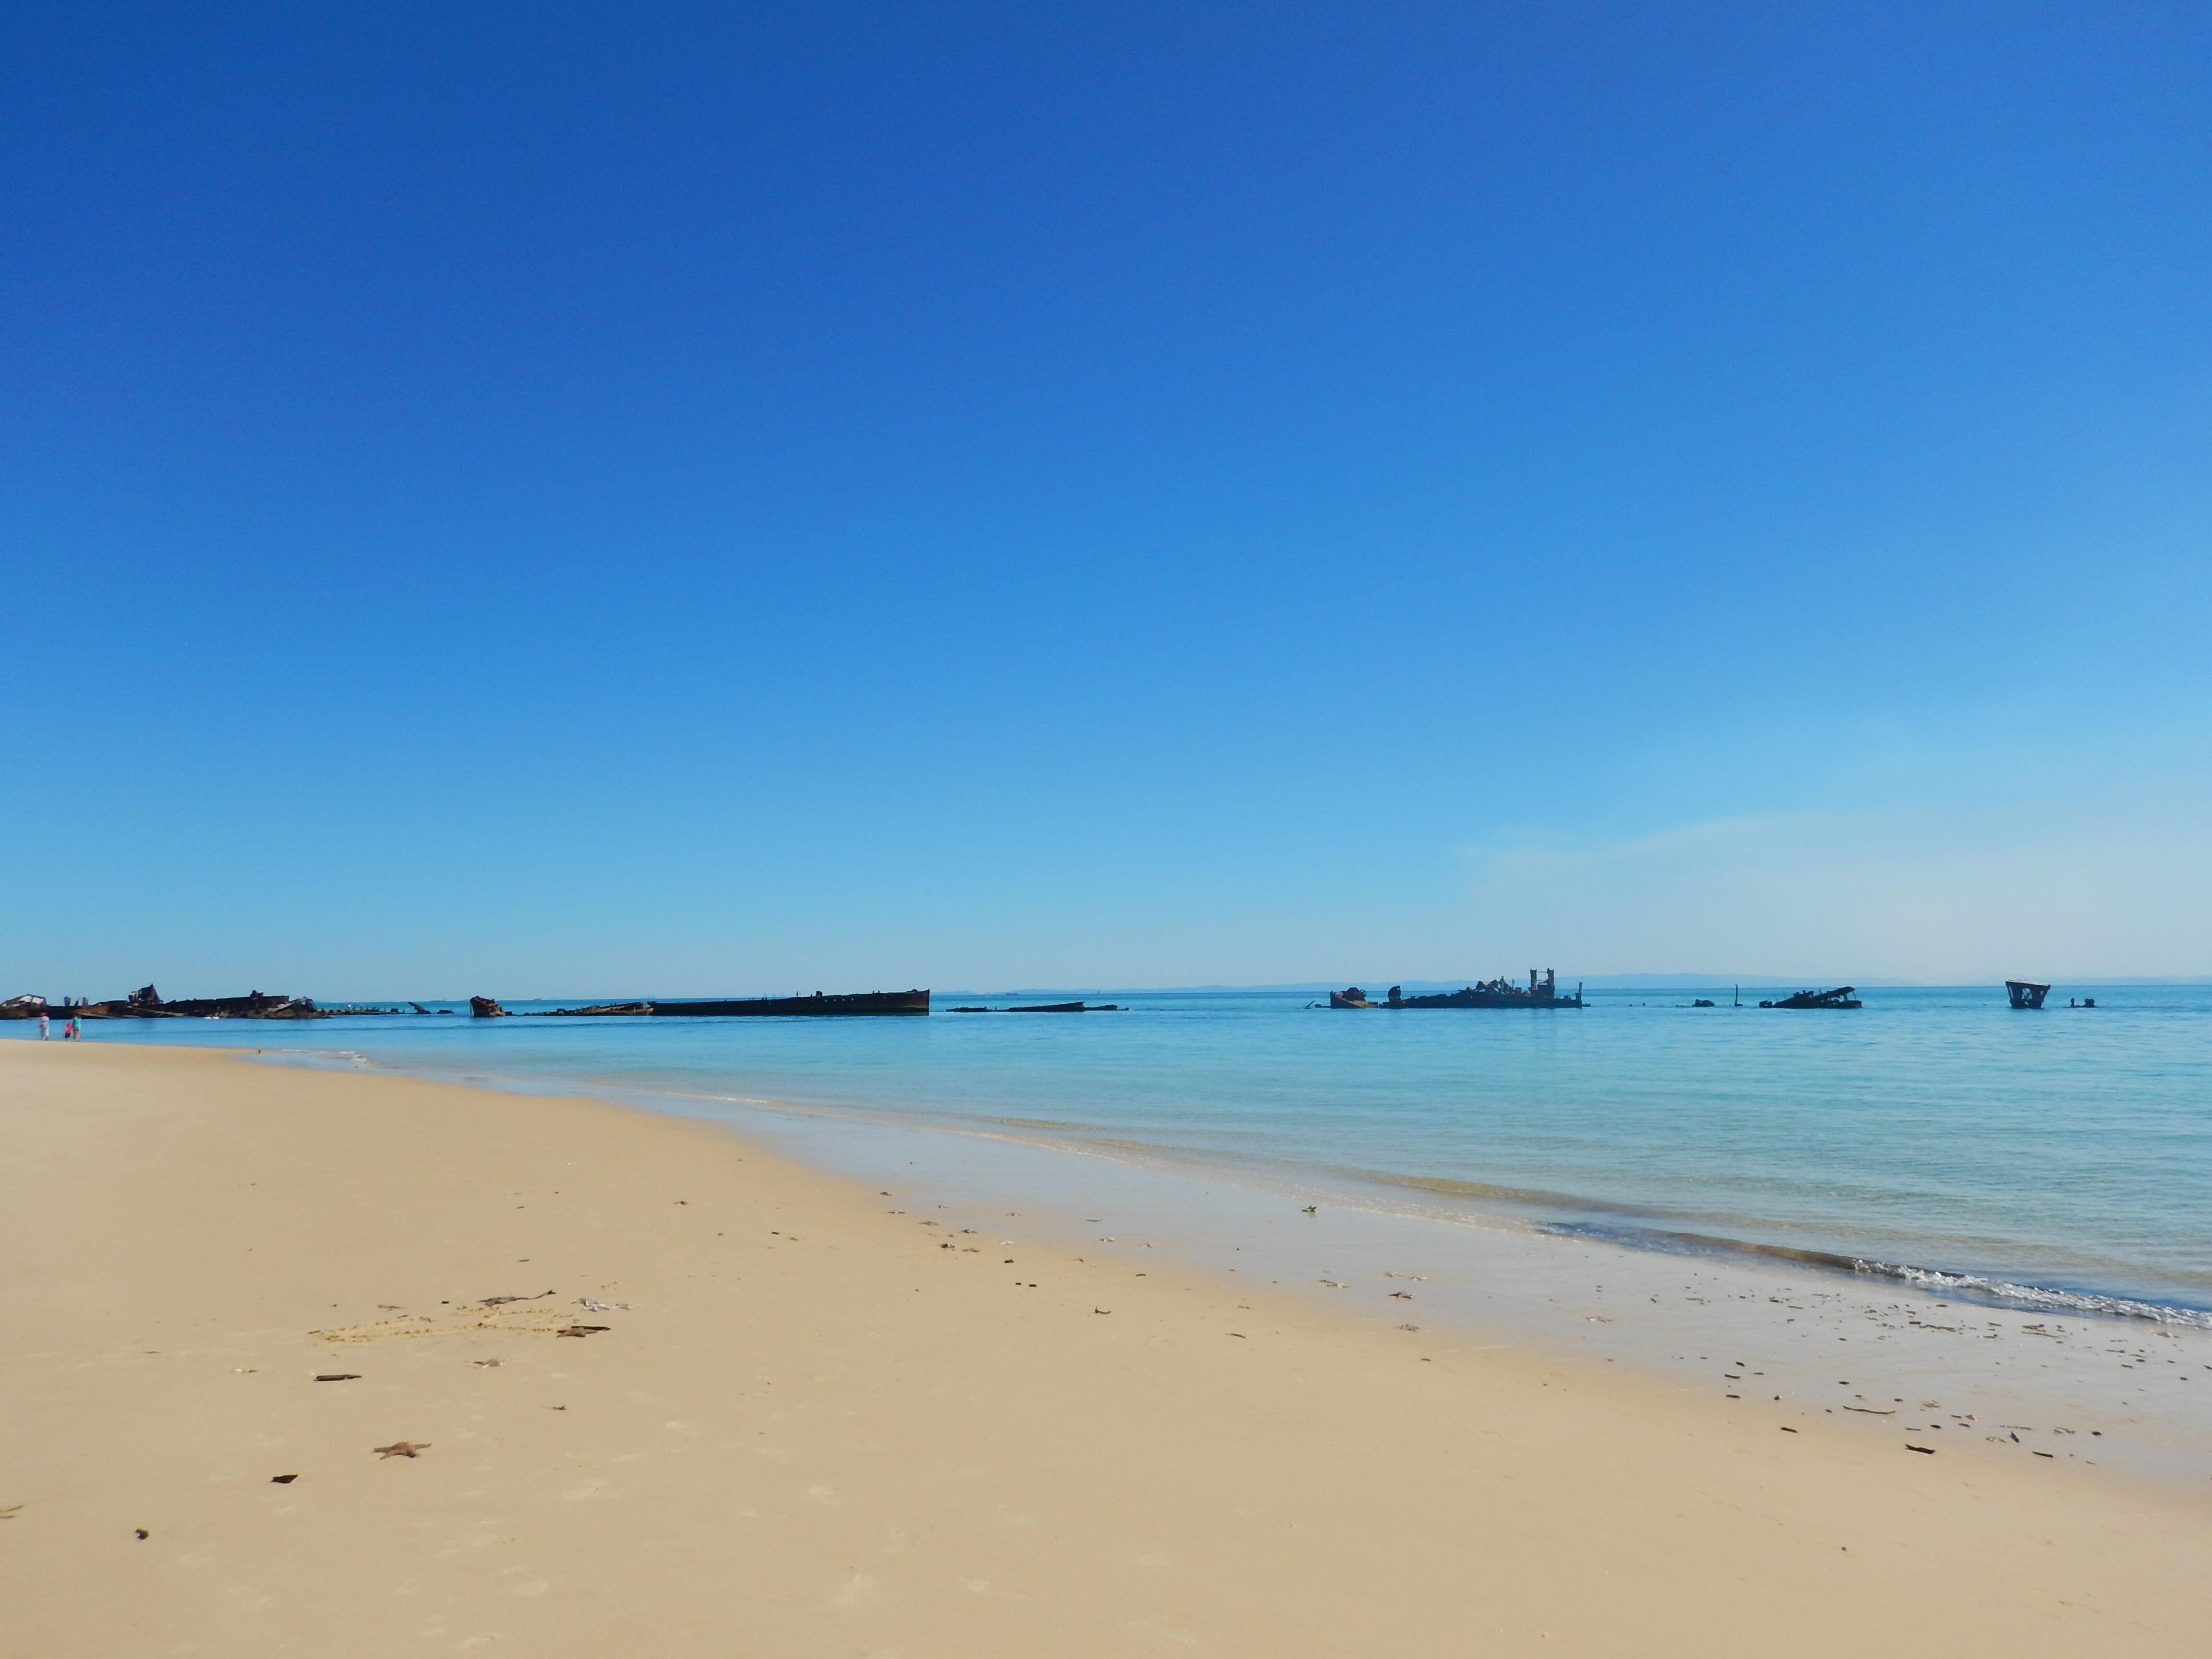 The Beach by Jessica Chaplin